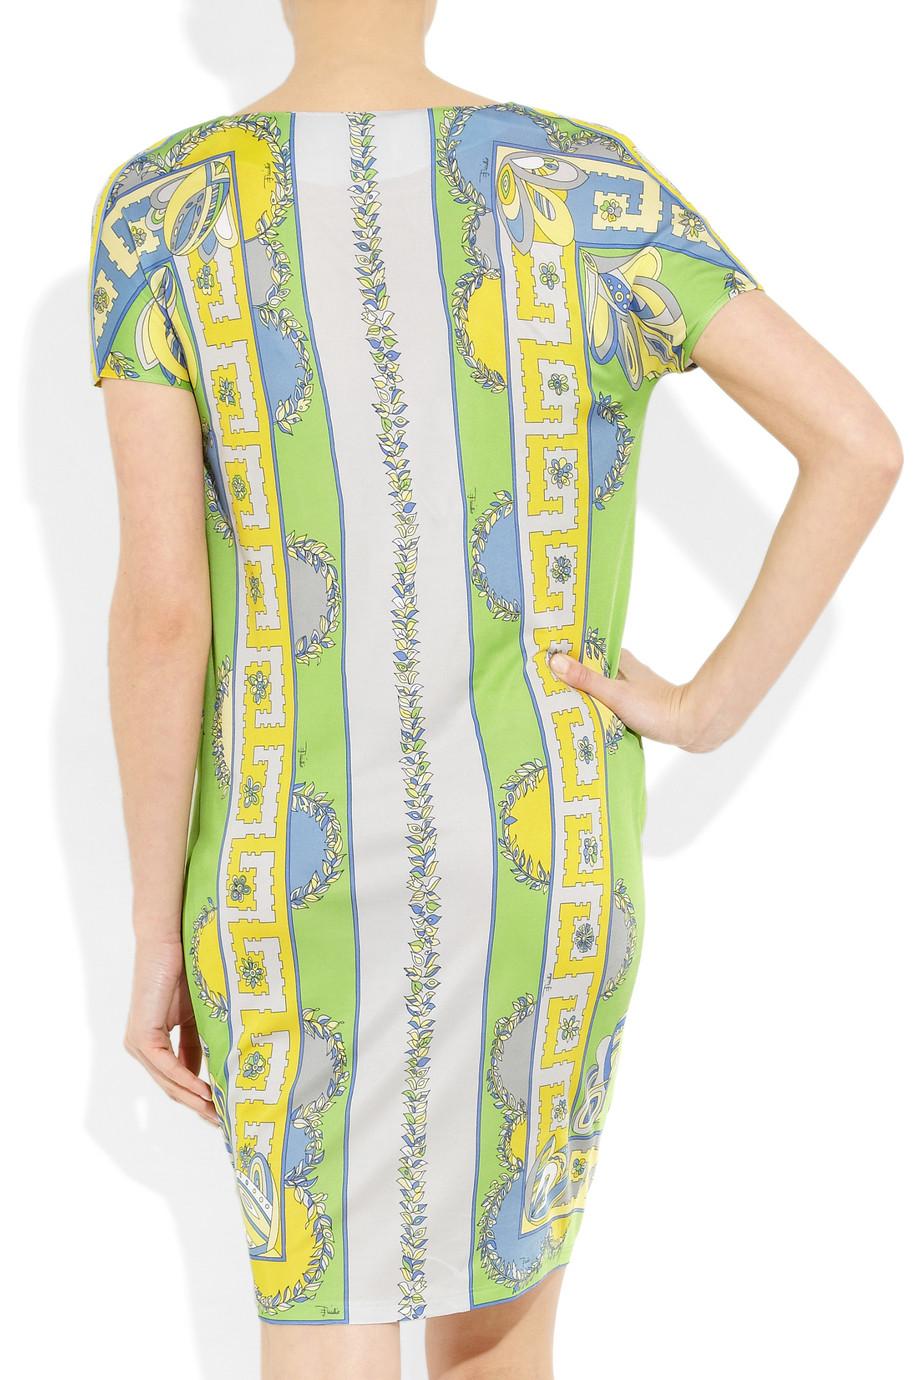 Emilio Pucci Printed Jersey Dress In Green Multicolored